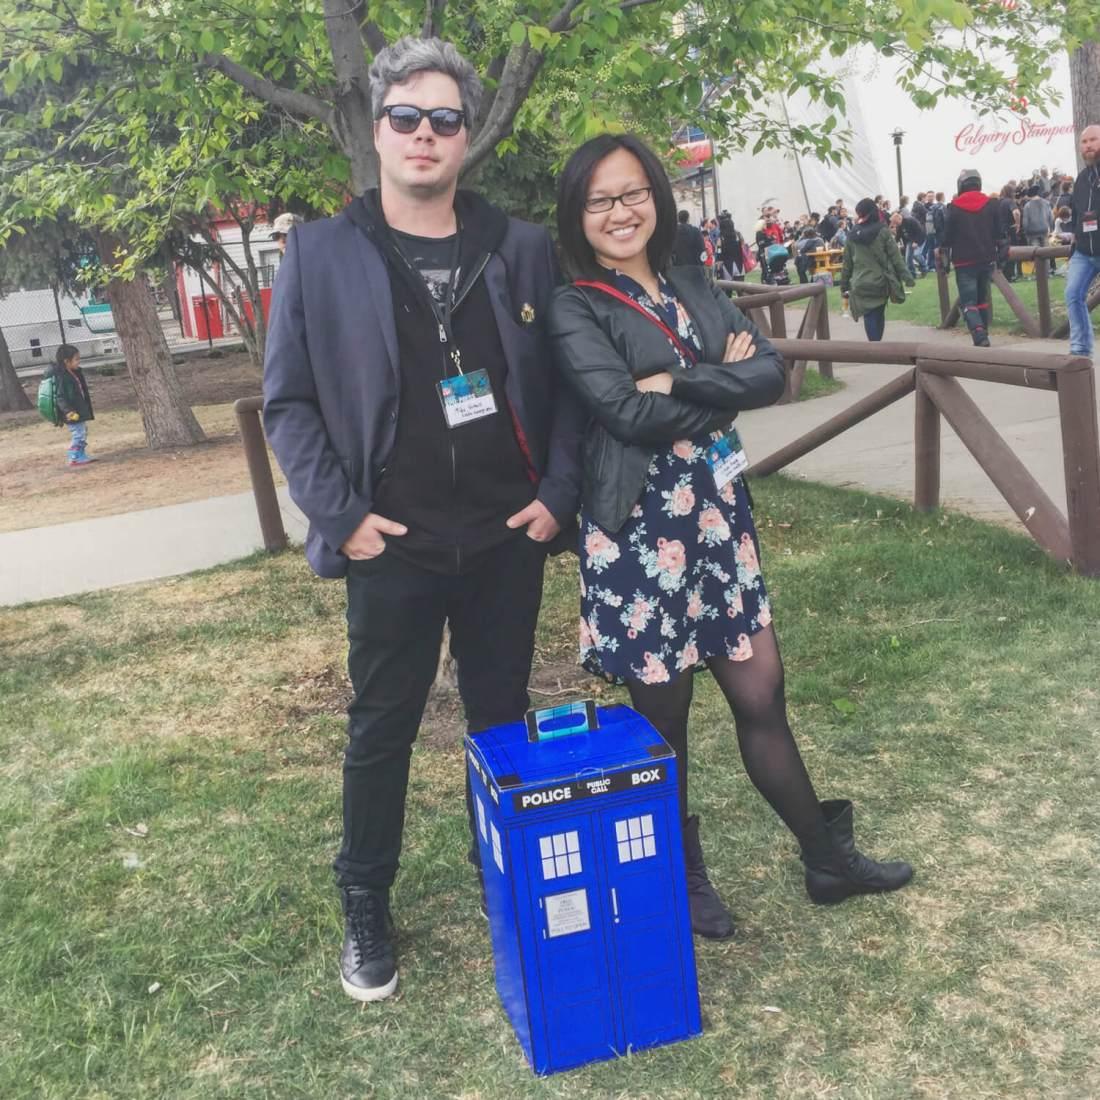 Doctor Who - Calgary Comic Entertainment Expo - Cosplay - Explore Alberta